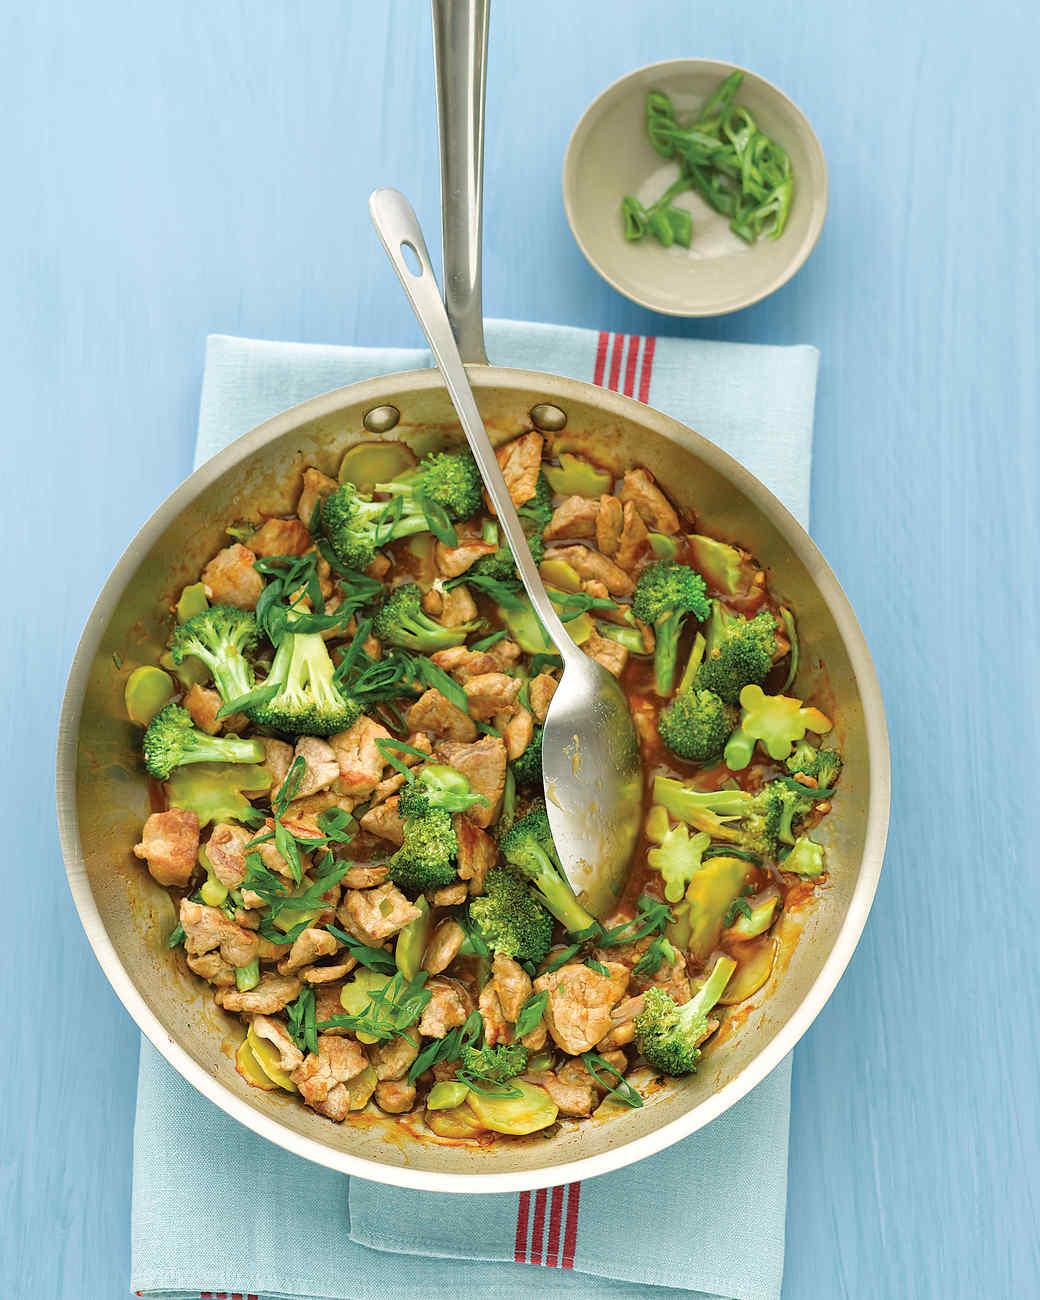 Broccoli and Pork Stir-Fry